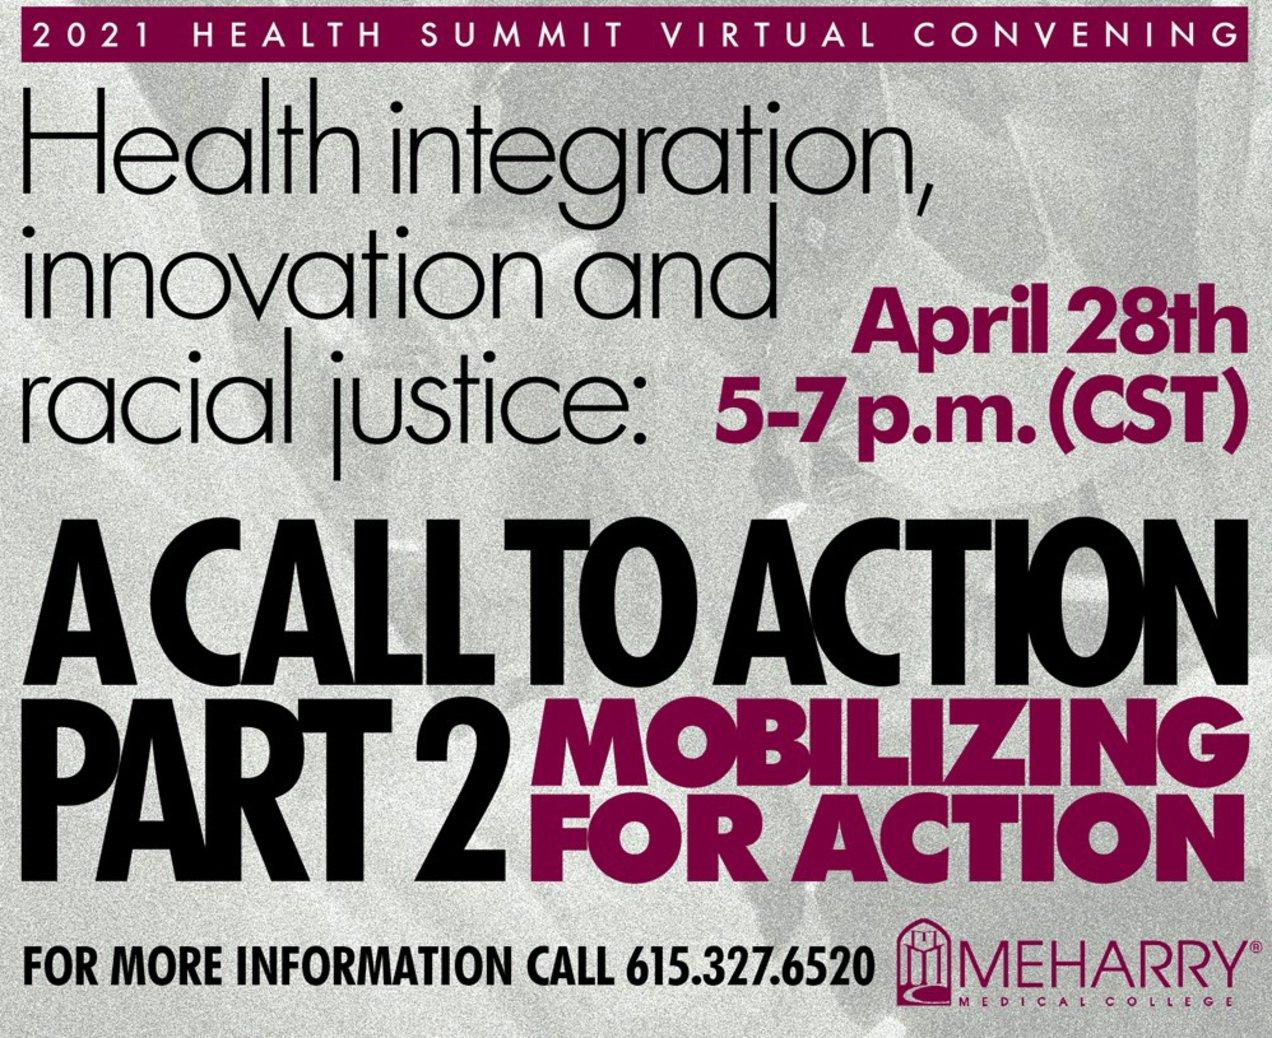 Virtual Health Summit